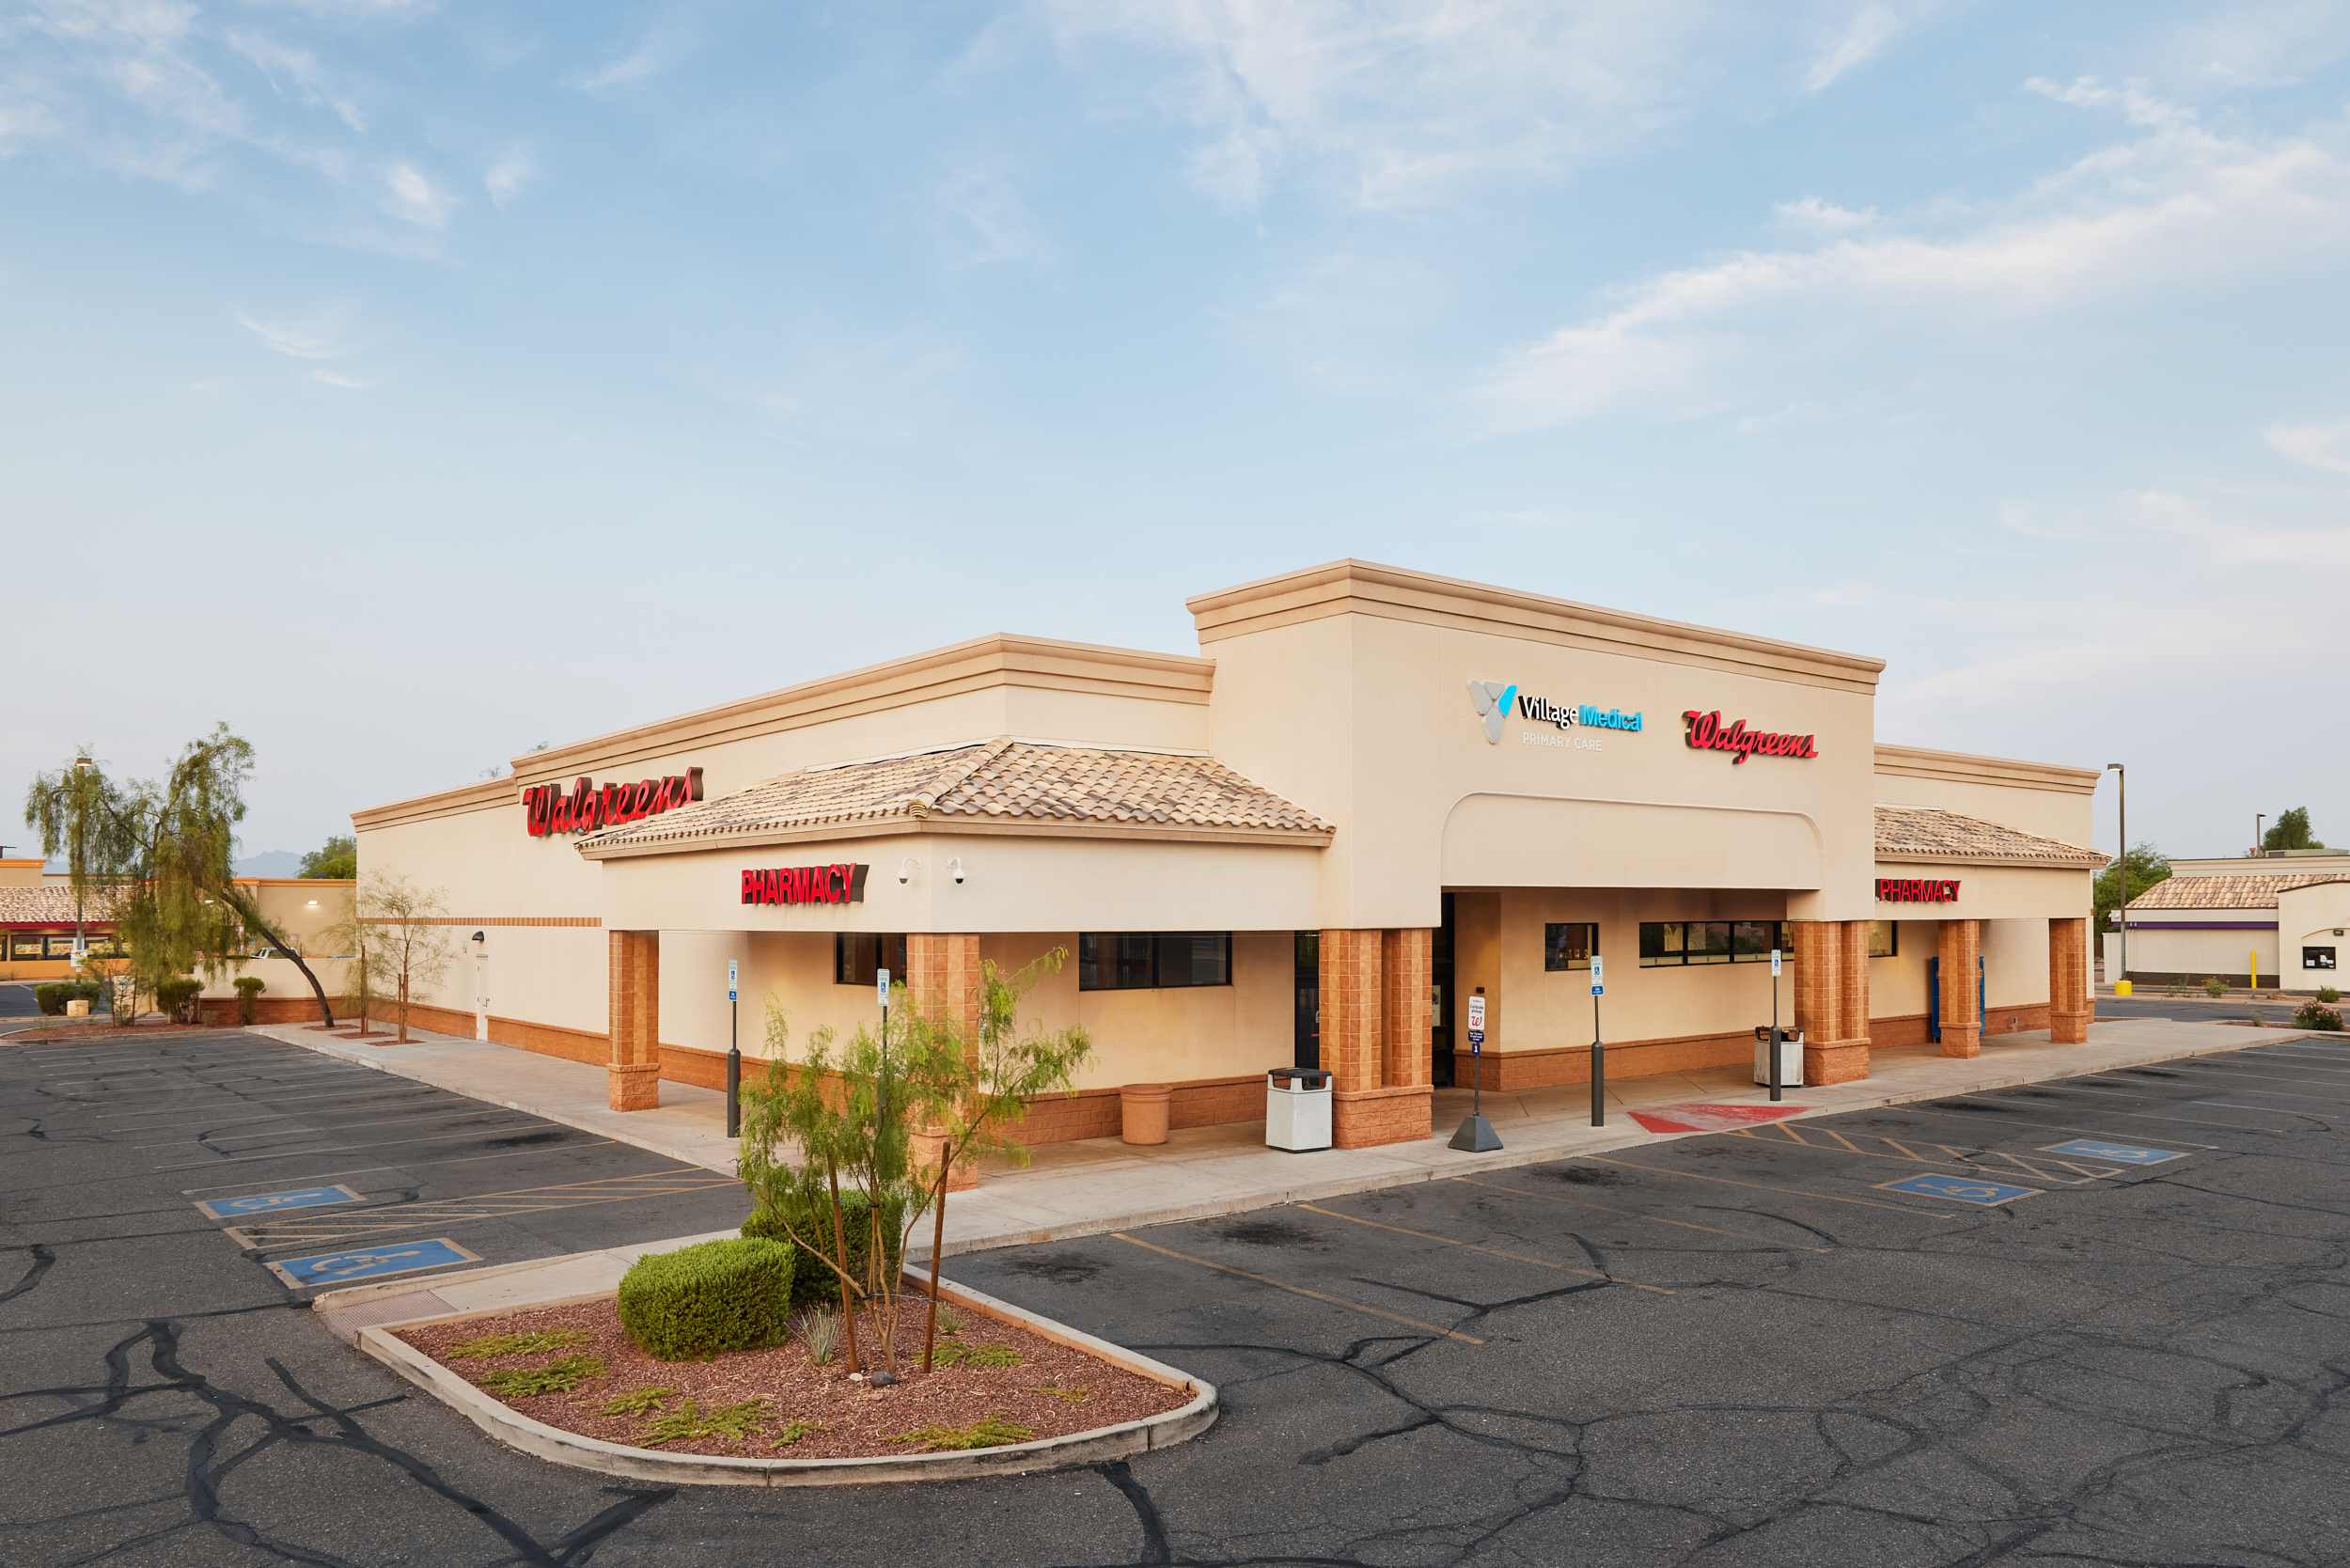 Village Medical at Walgreens - 10705 W. Indian School Rd. Suite. 100 Avondale, AZ 85392